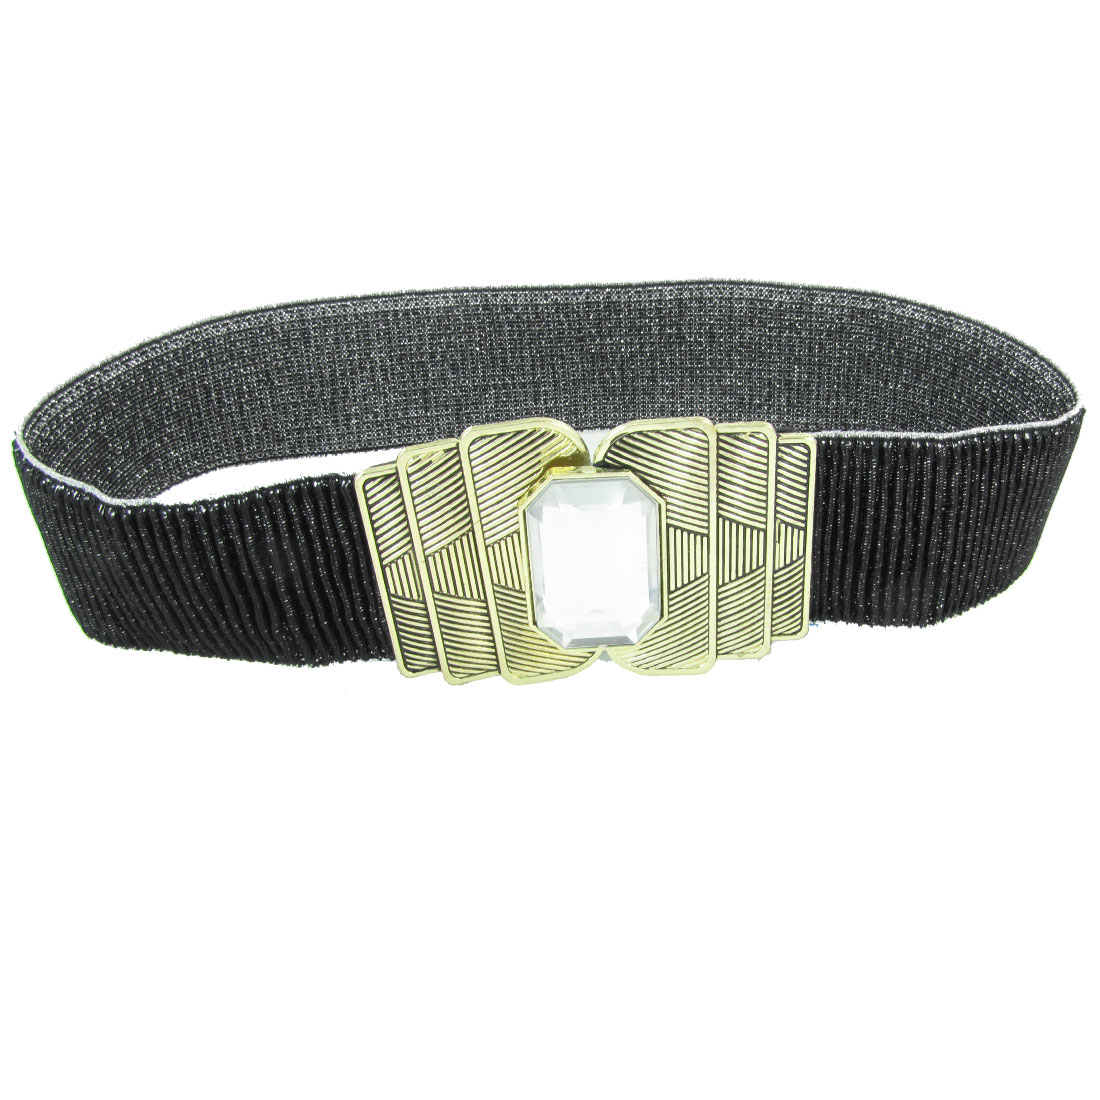 Women Metal Striped Pattern Interlocking Closure Elastic Cinch Waist Belt Black